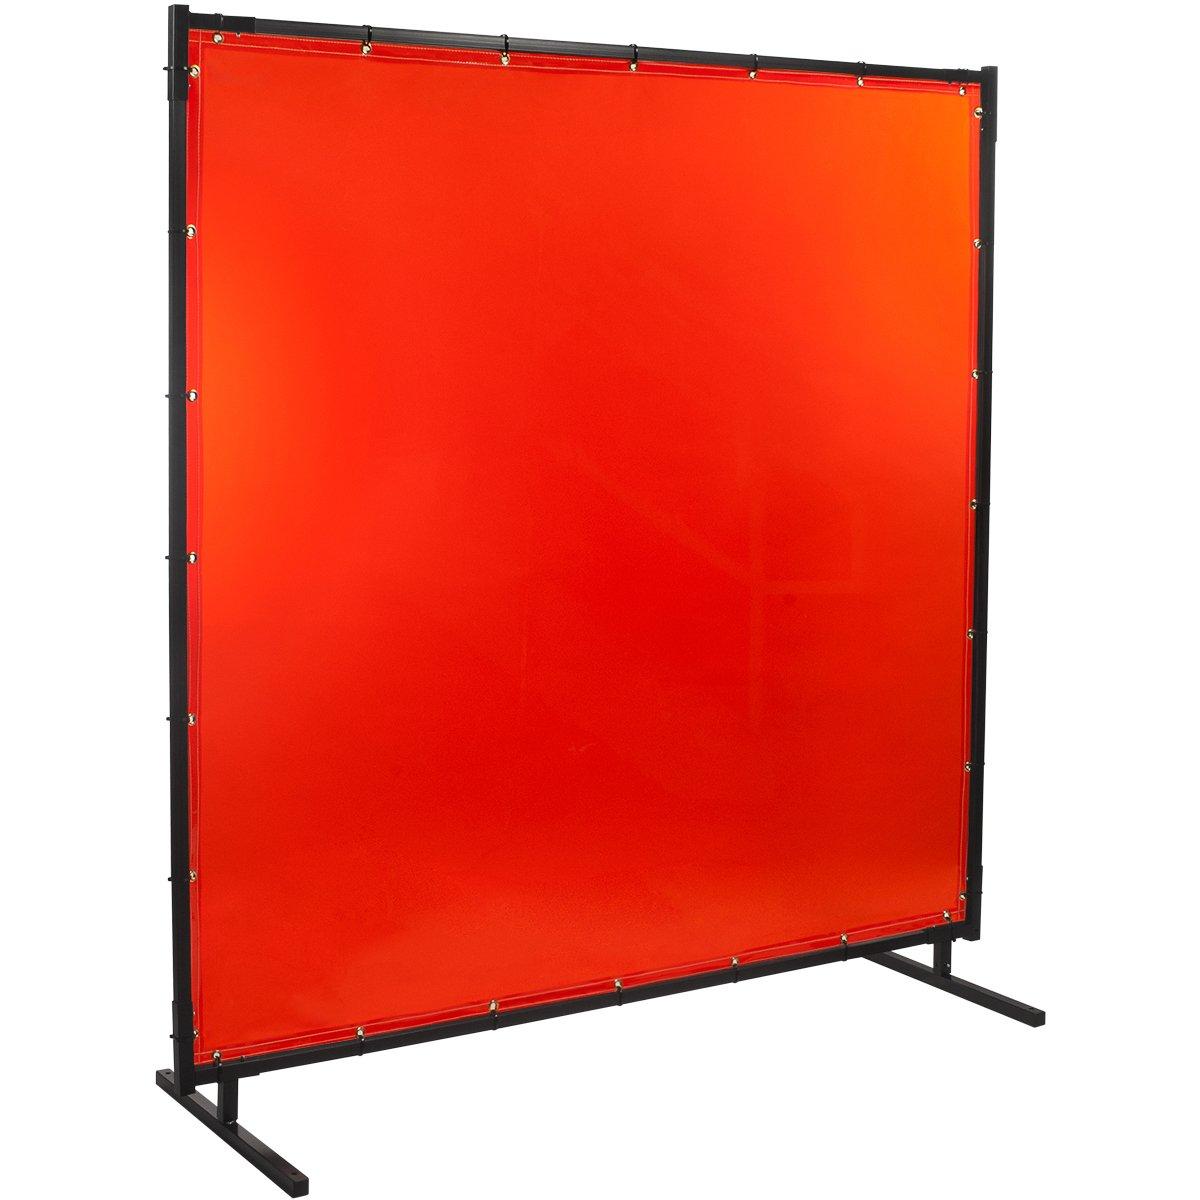 Steiner 538HD-5X6 Protect-O-Screen HD Welding Screen with Flame Retardant 14 Mil Tinted Transparent Vinyl Curtain, Orange, 5' x 6' 5' x 6' ERB